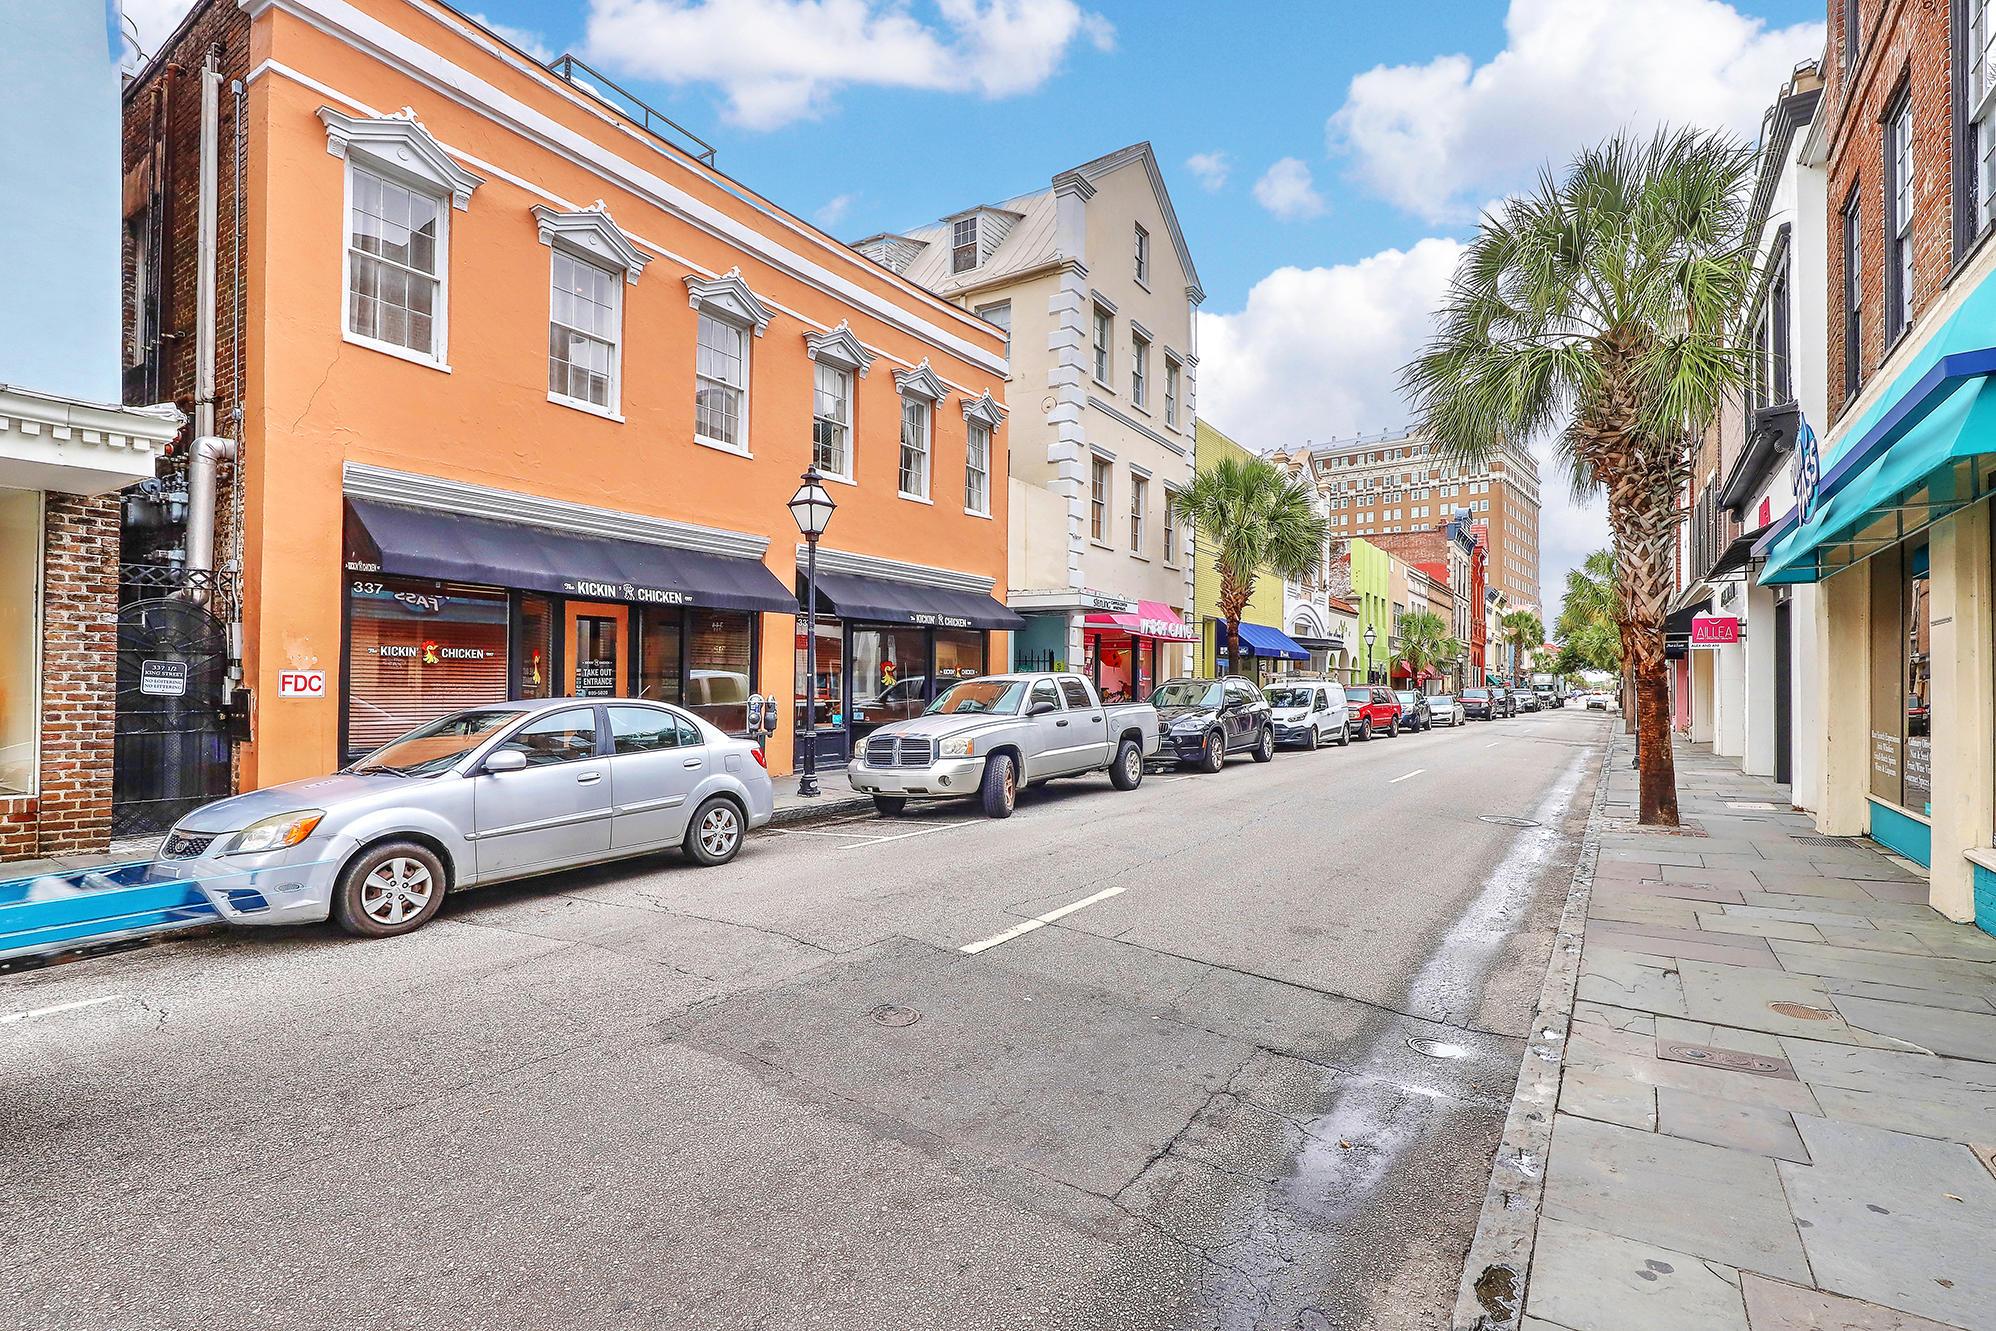 King Street Lofts Homes For Sale - 350 King, Charleston, SC - 0